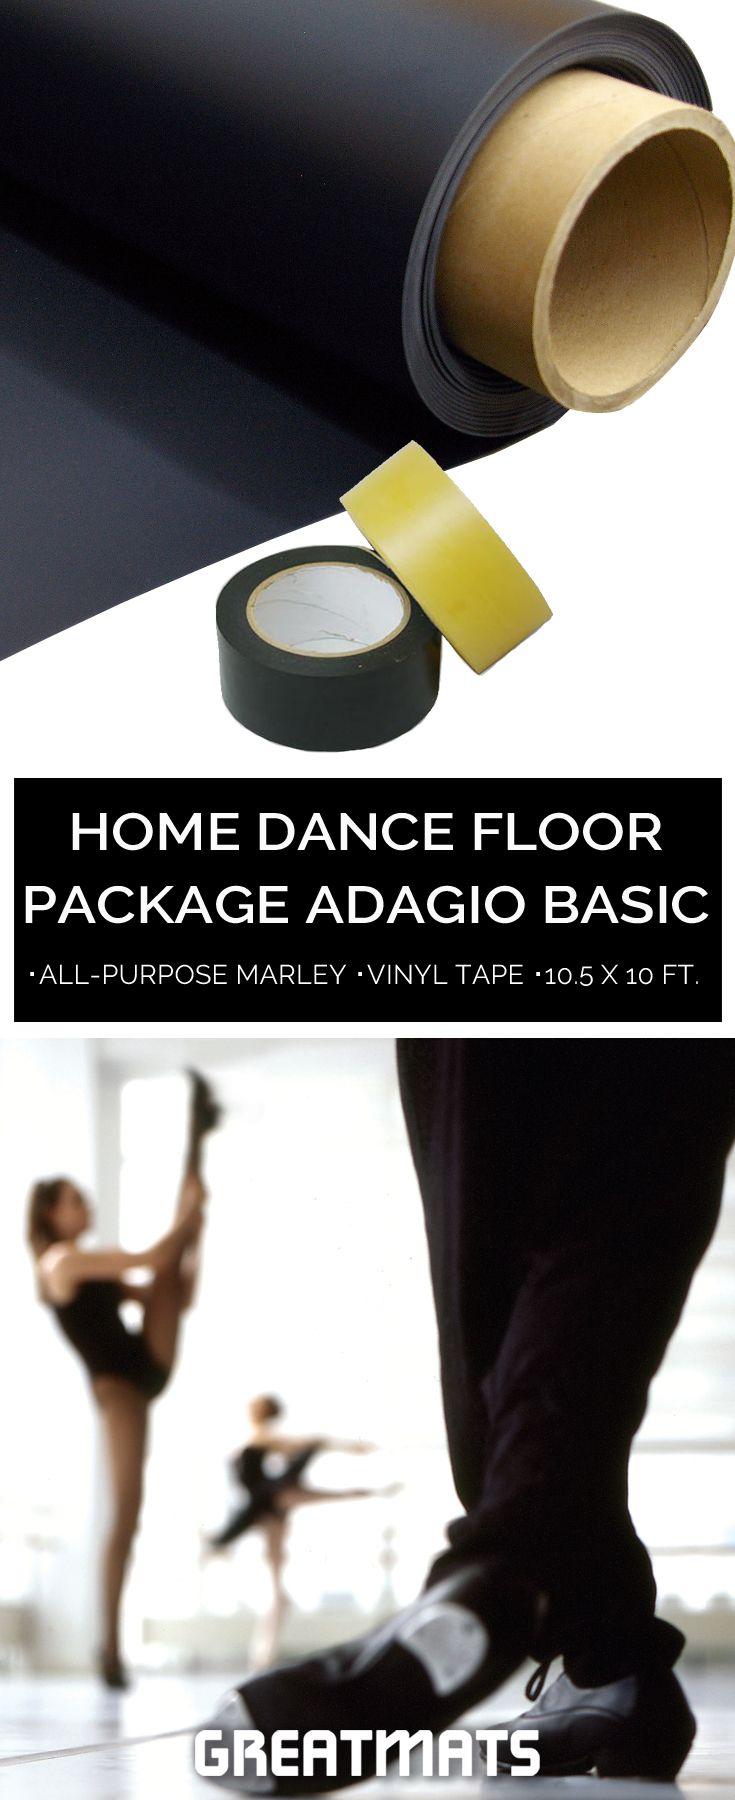 Home Dance Floor Package Adagio Basic 10 5x10 Ft Home Dance Dance Rooms Dance Floor